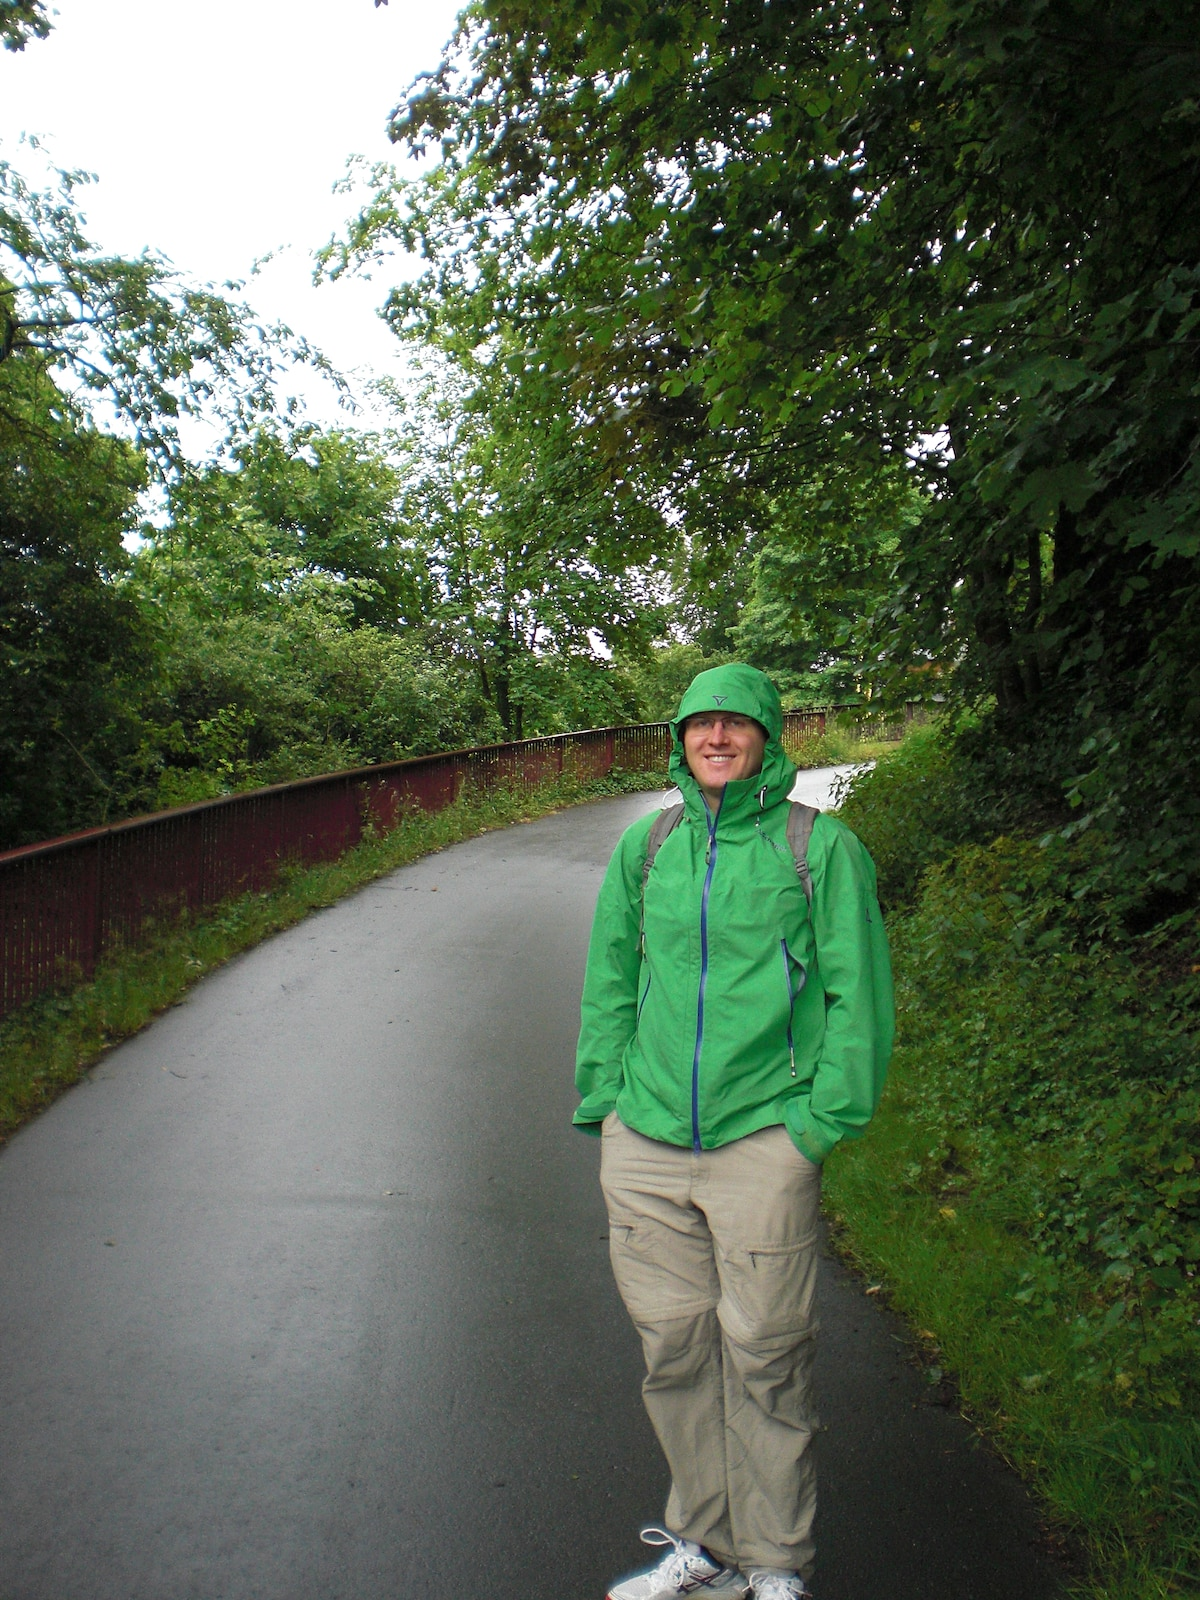 Charlotte From Kelkheim, Germany